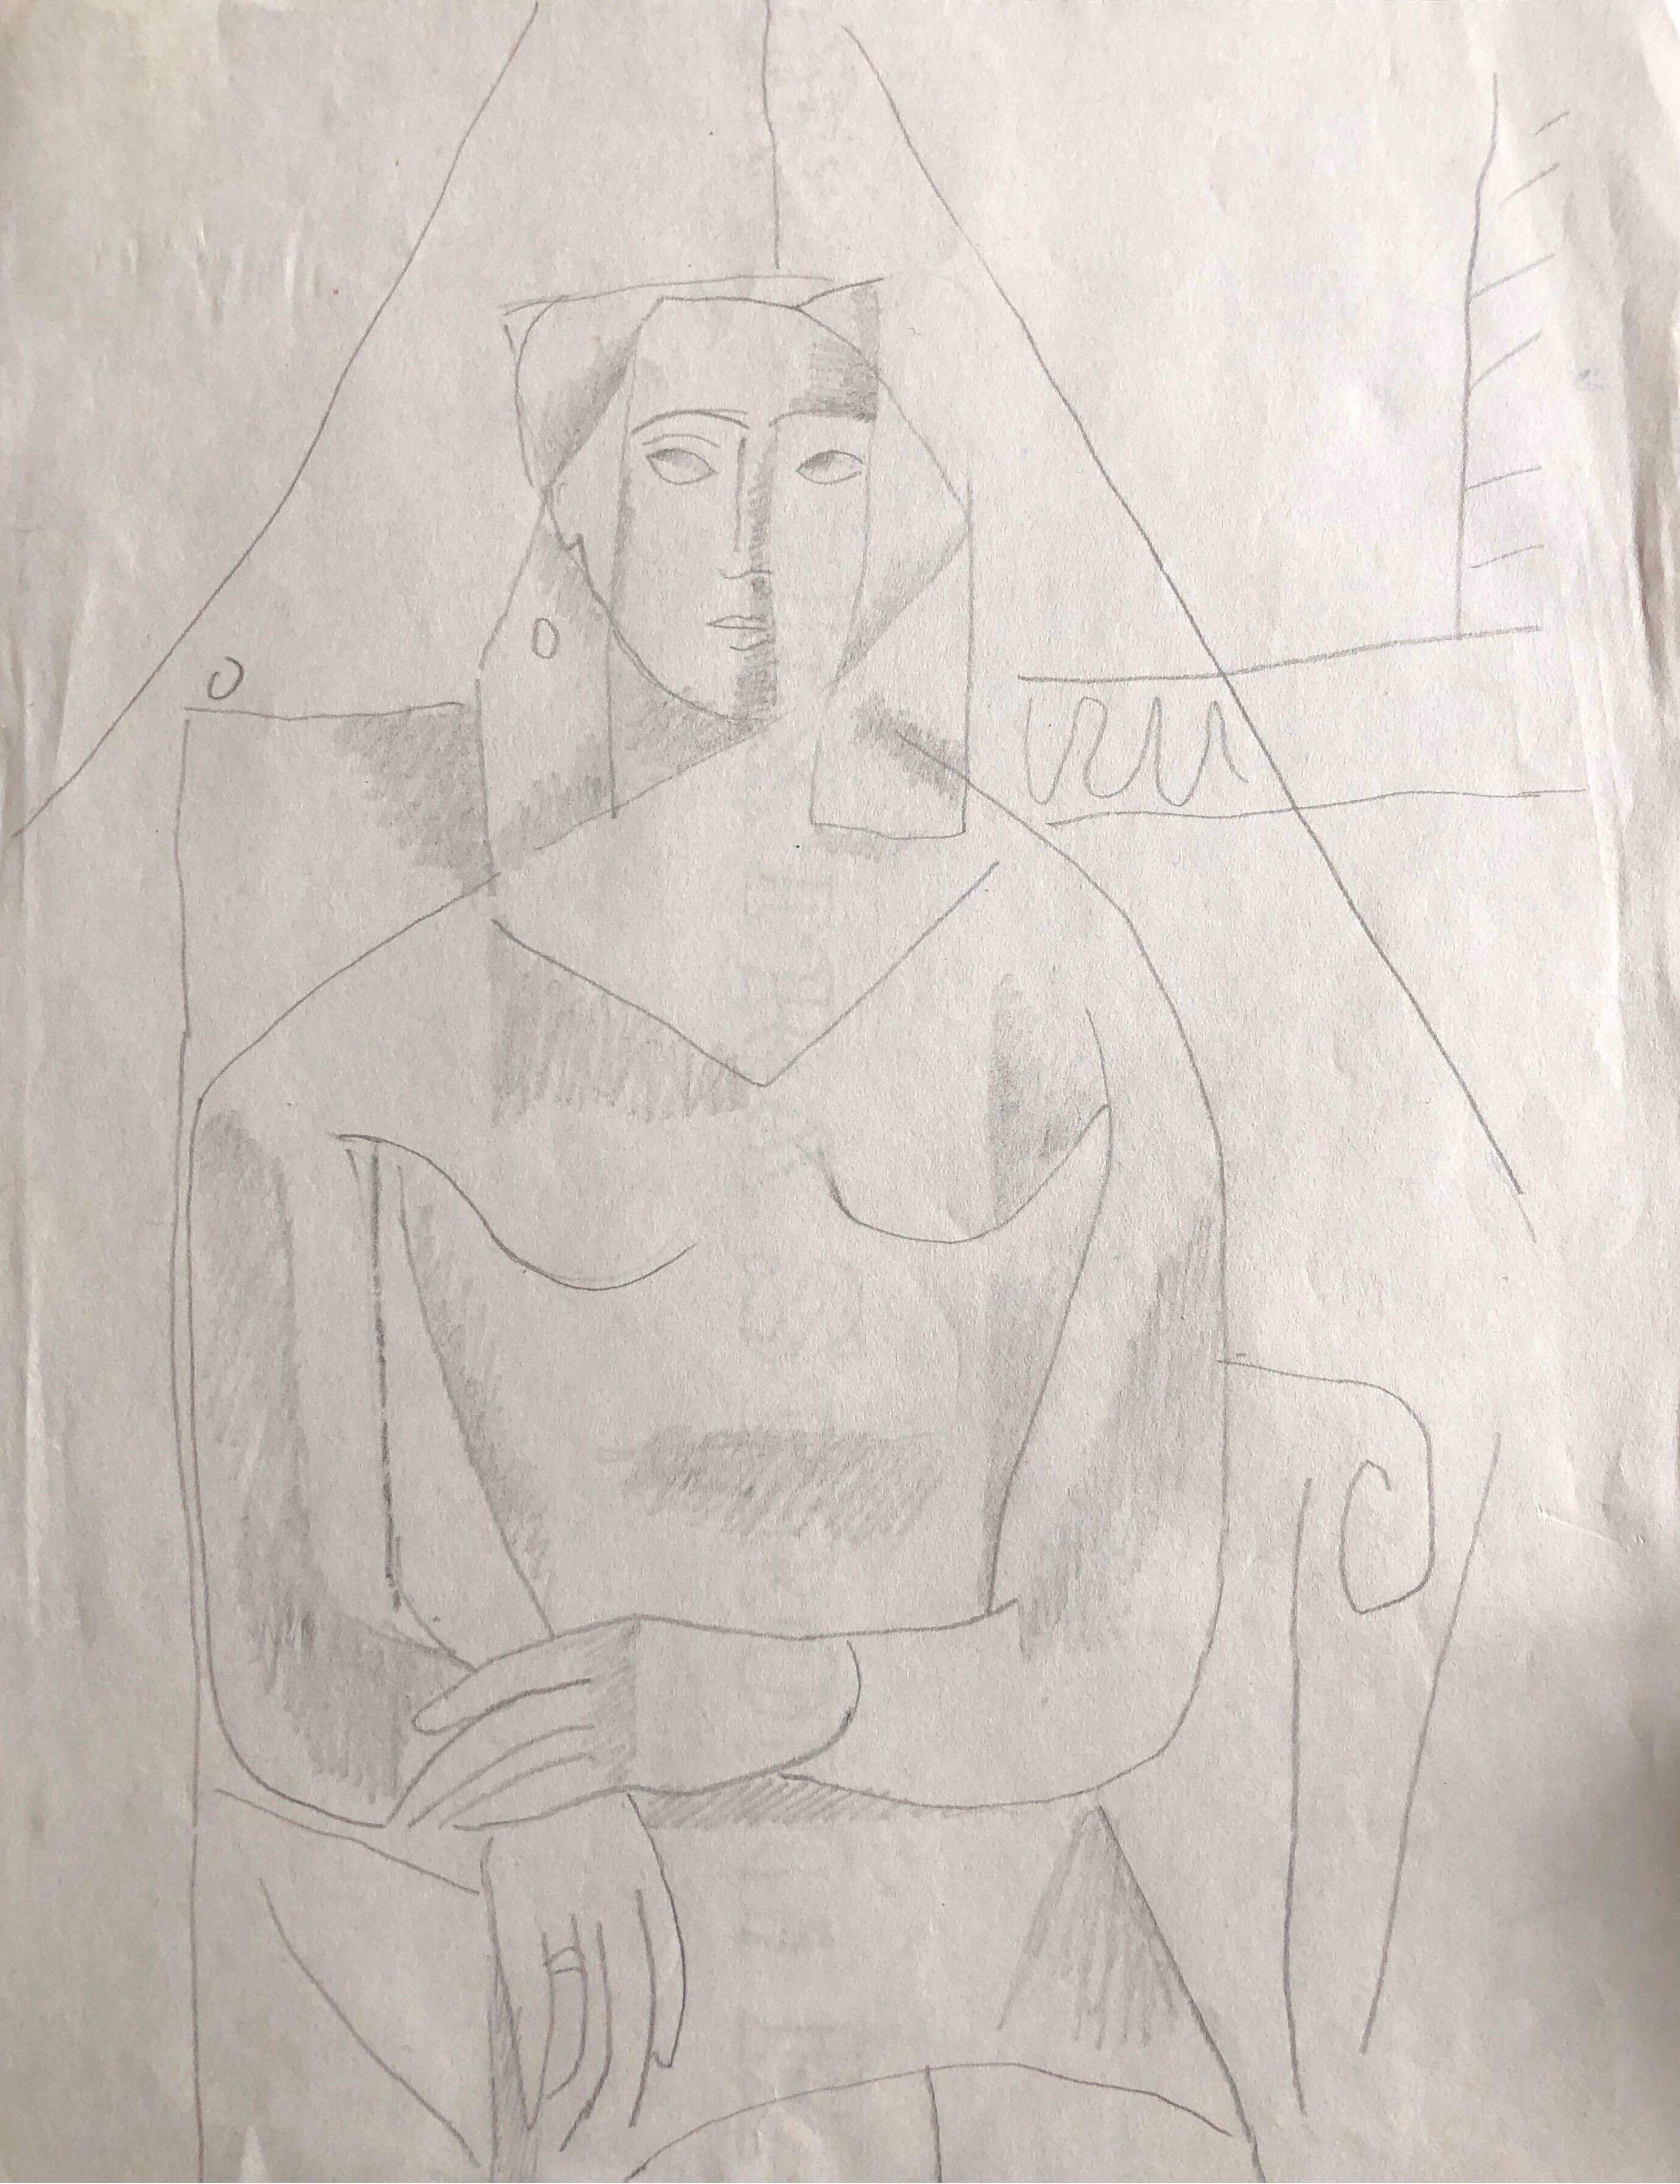 CARLOS CARNERO (1922-1980) ORIGINAL DRAWING BY FERNAND LEGER STUDIO WORKER